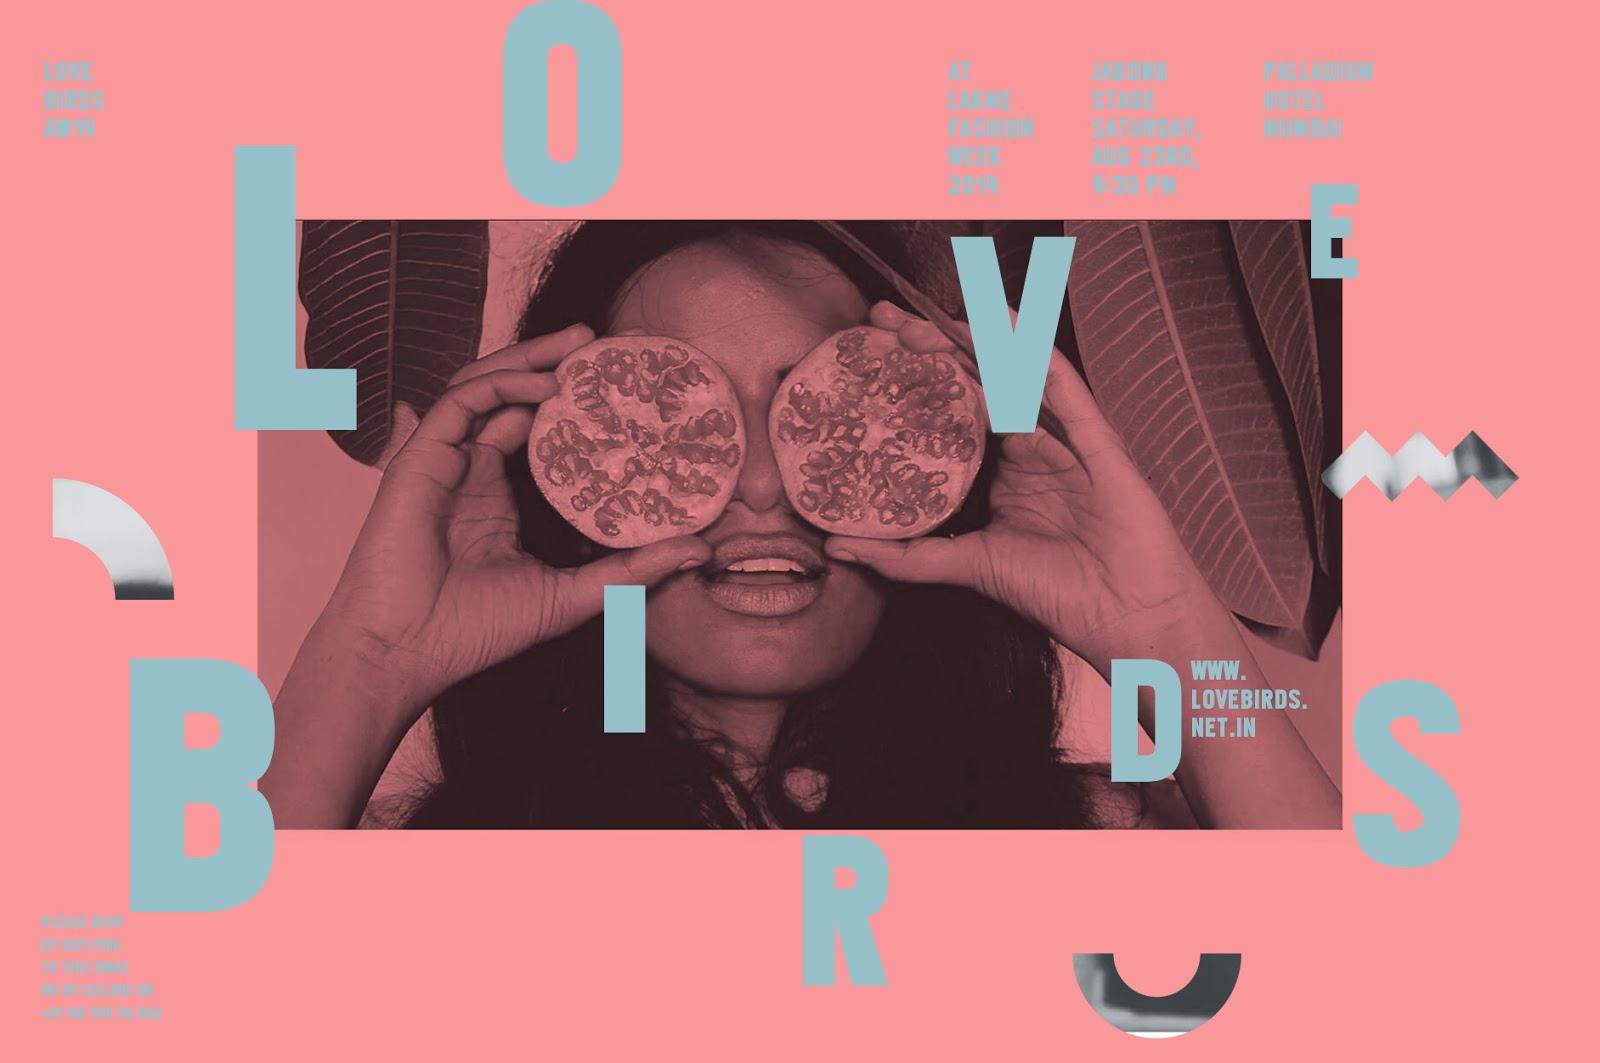 bound-design-art-fashion-culture-india-lovebirds4.jpg